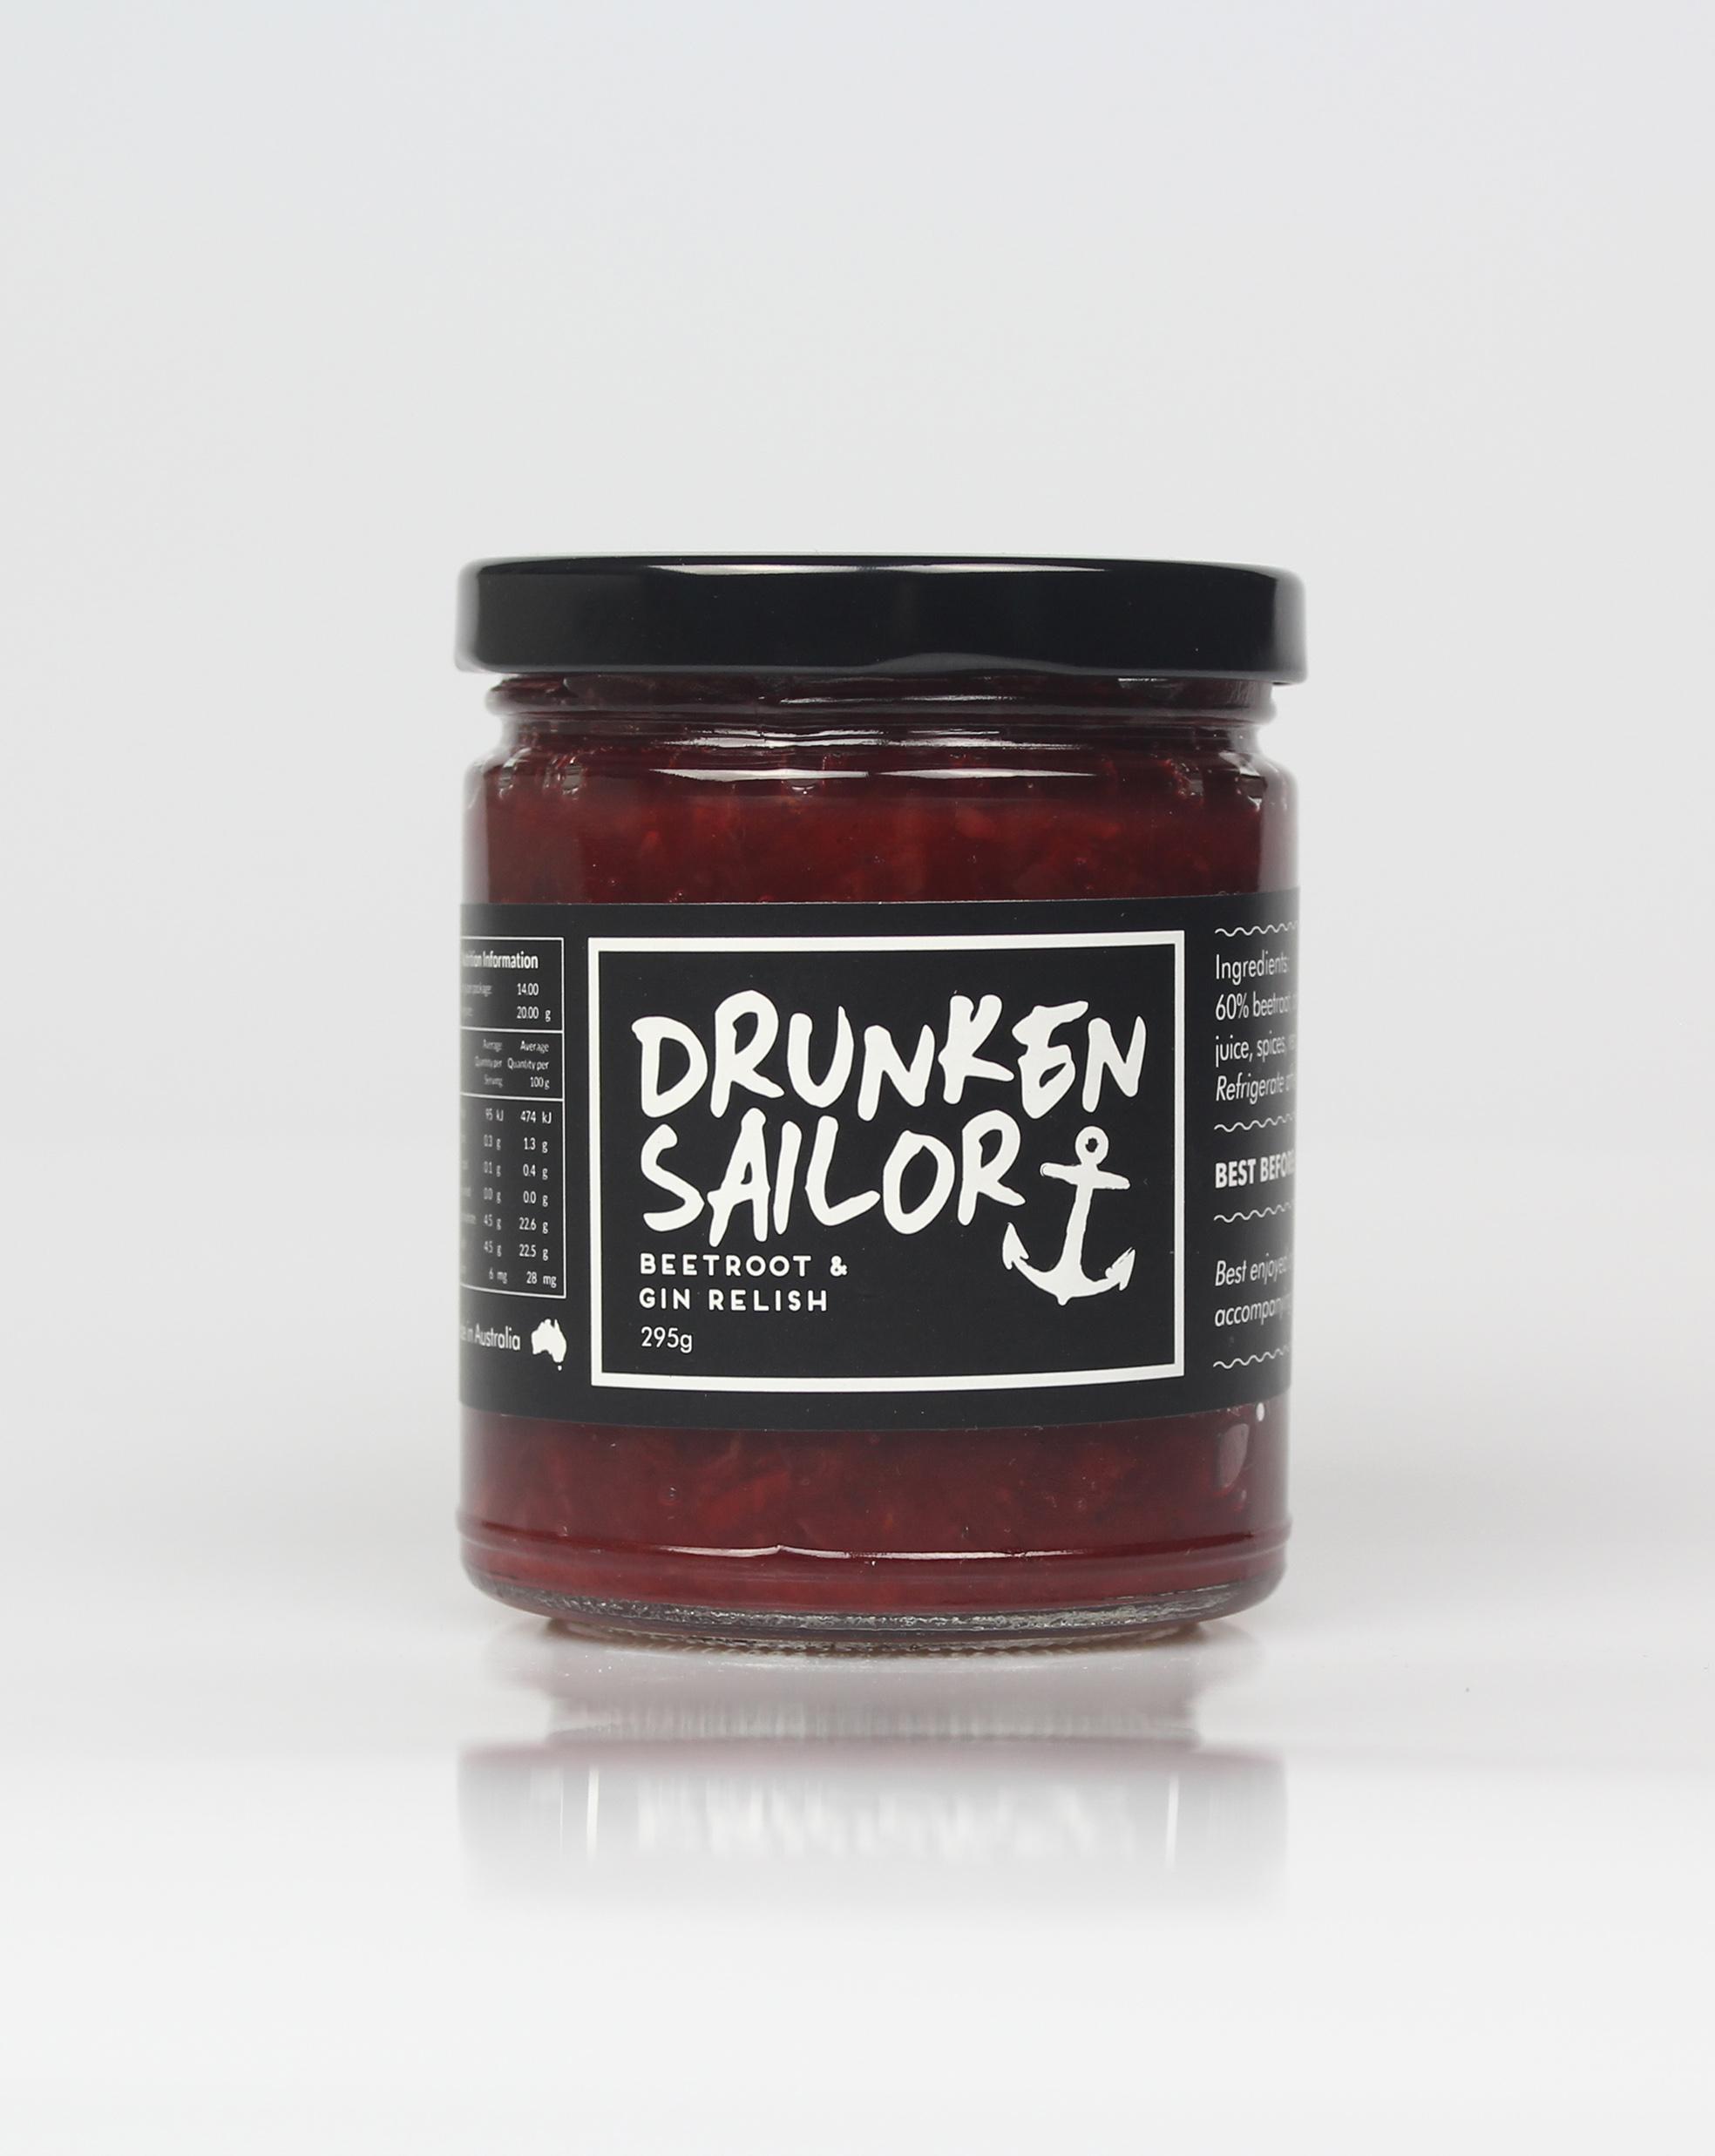 Drunken Sailor Beetroot & Gin Relish 260g